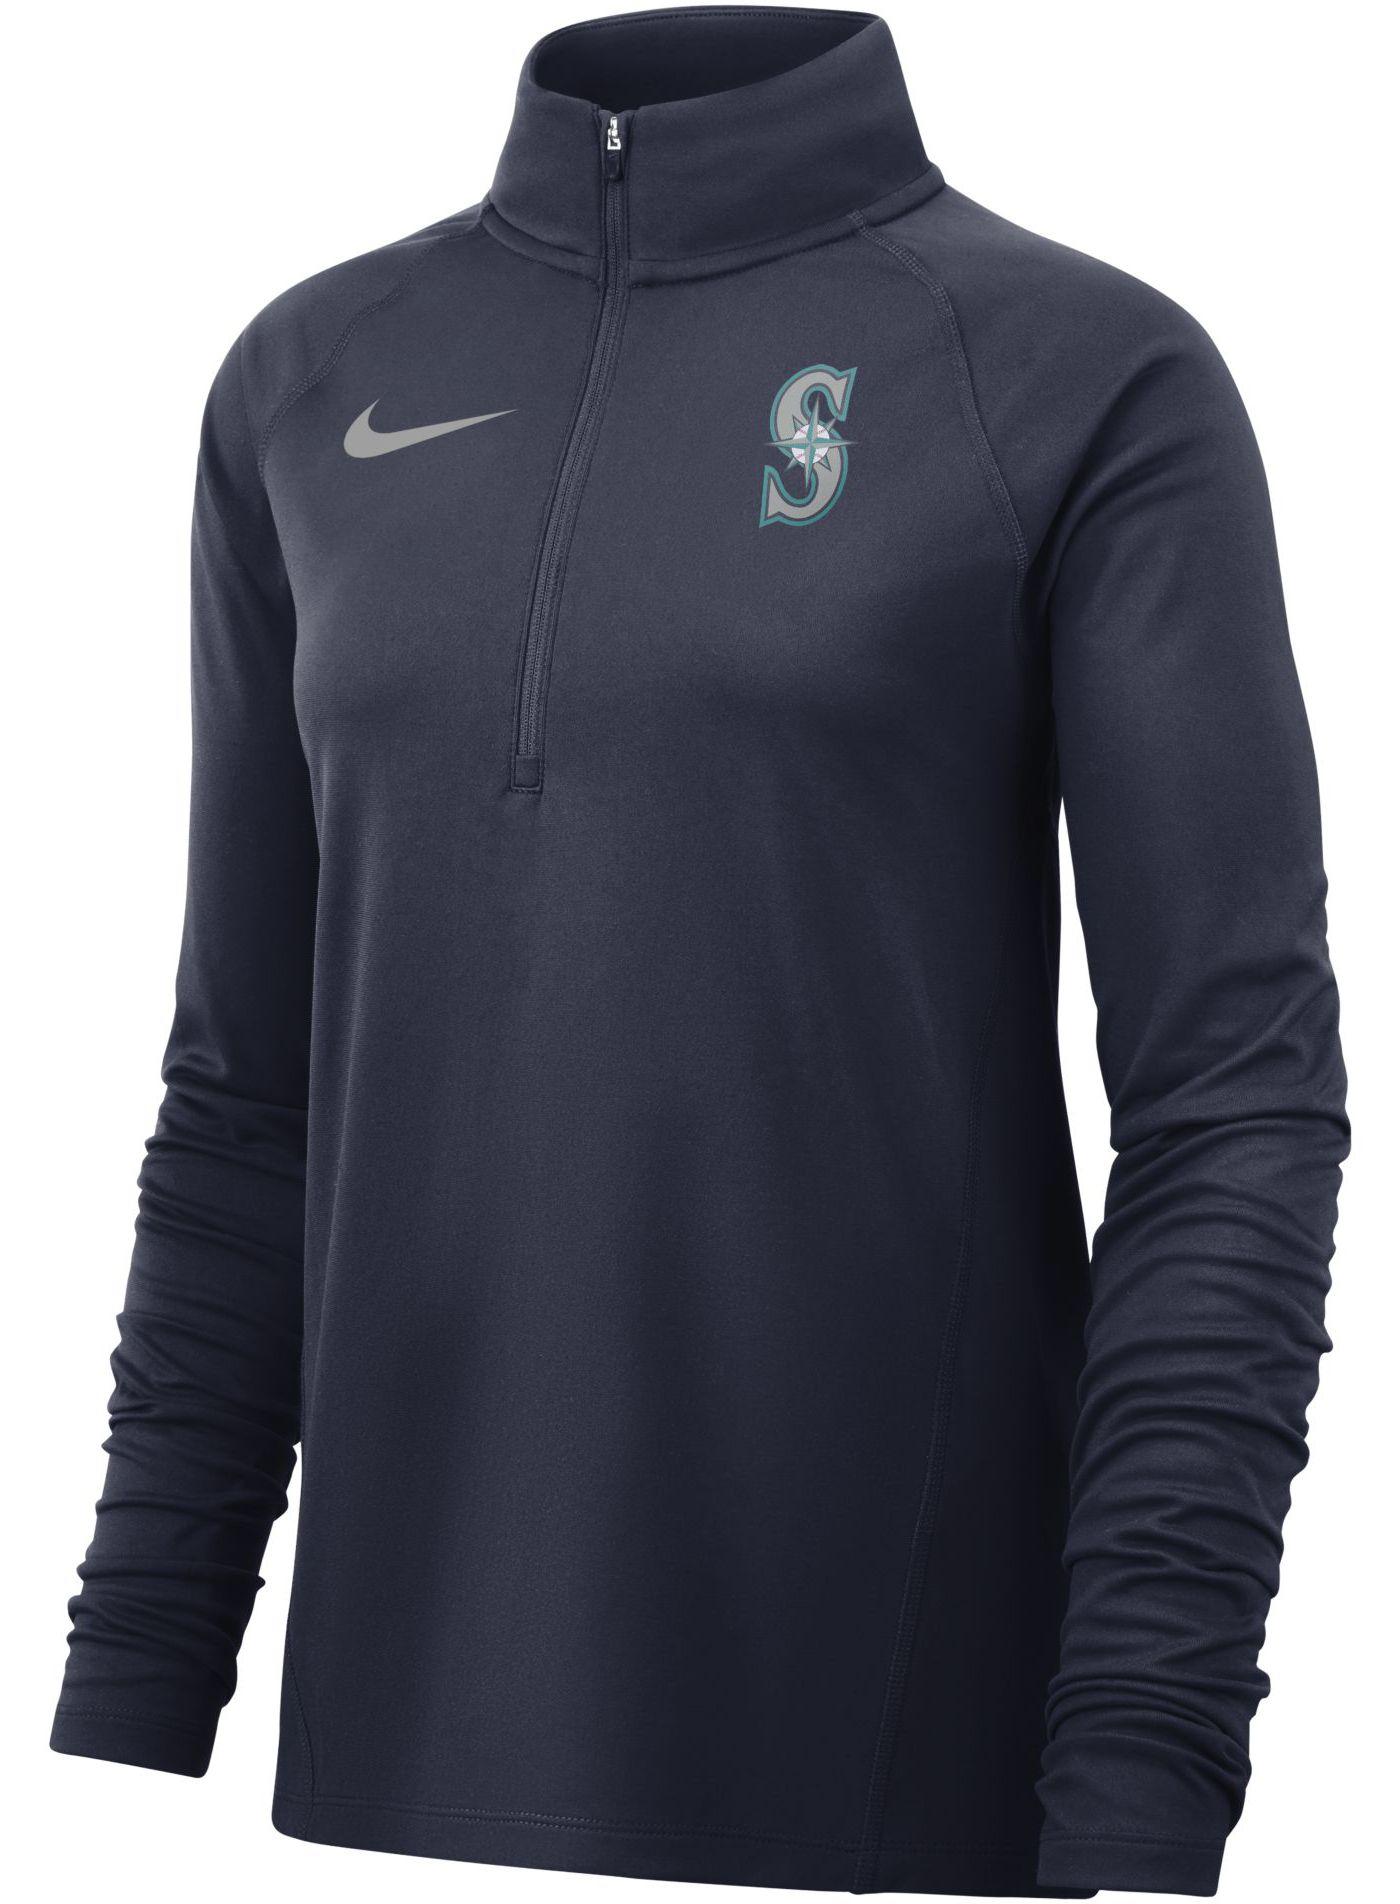 Nike Women's Seattle Mariners Dri-FIT Half-Zip Pullover